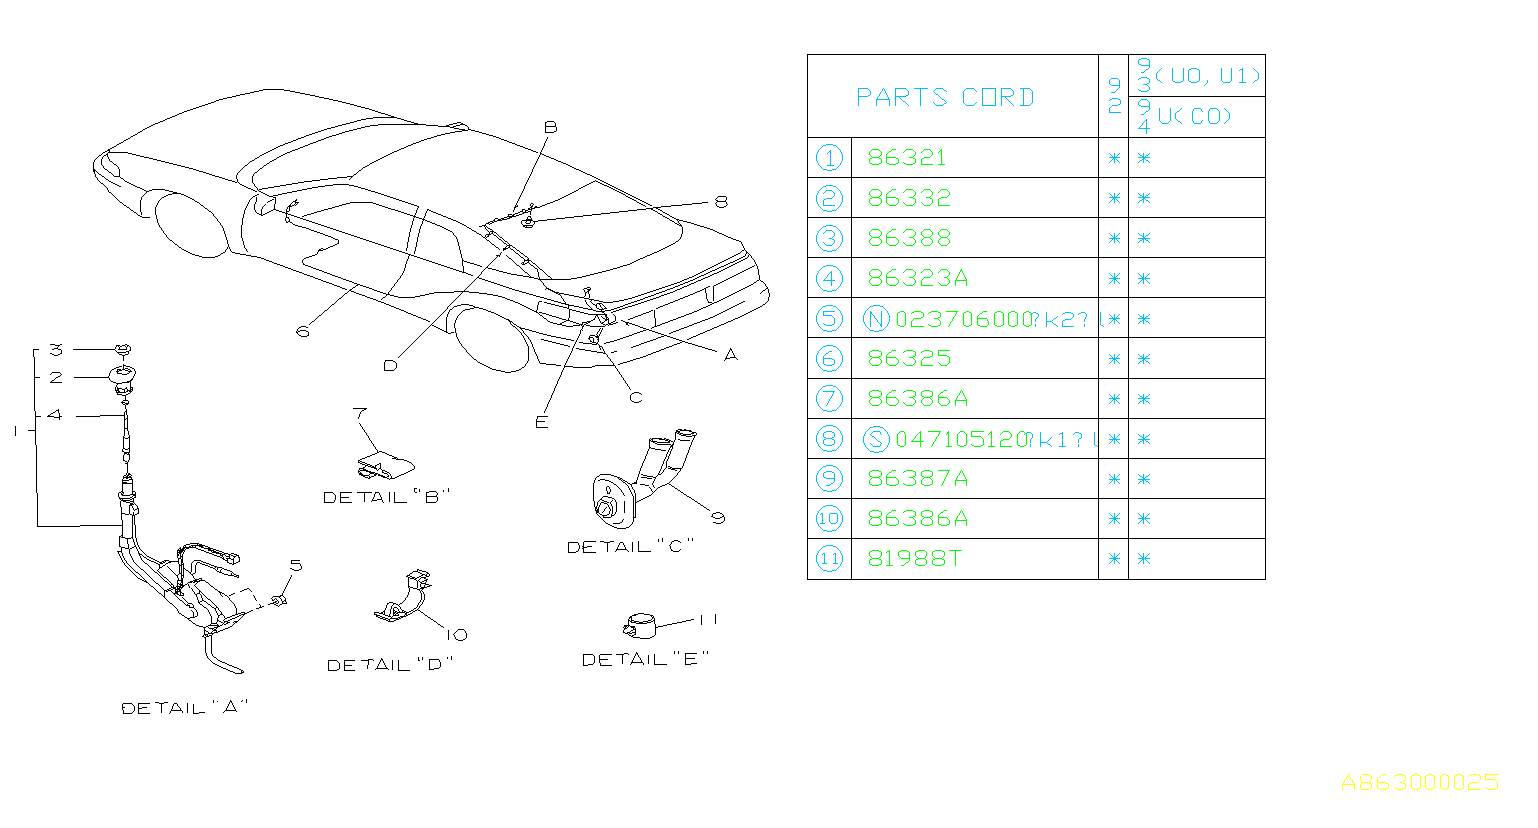 Subaru Svx Sunroof Drain Hose Clip